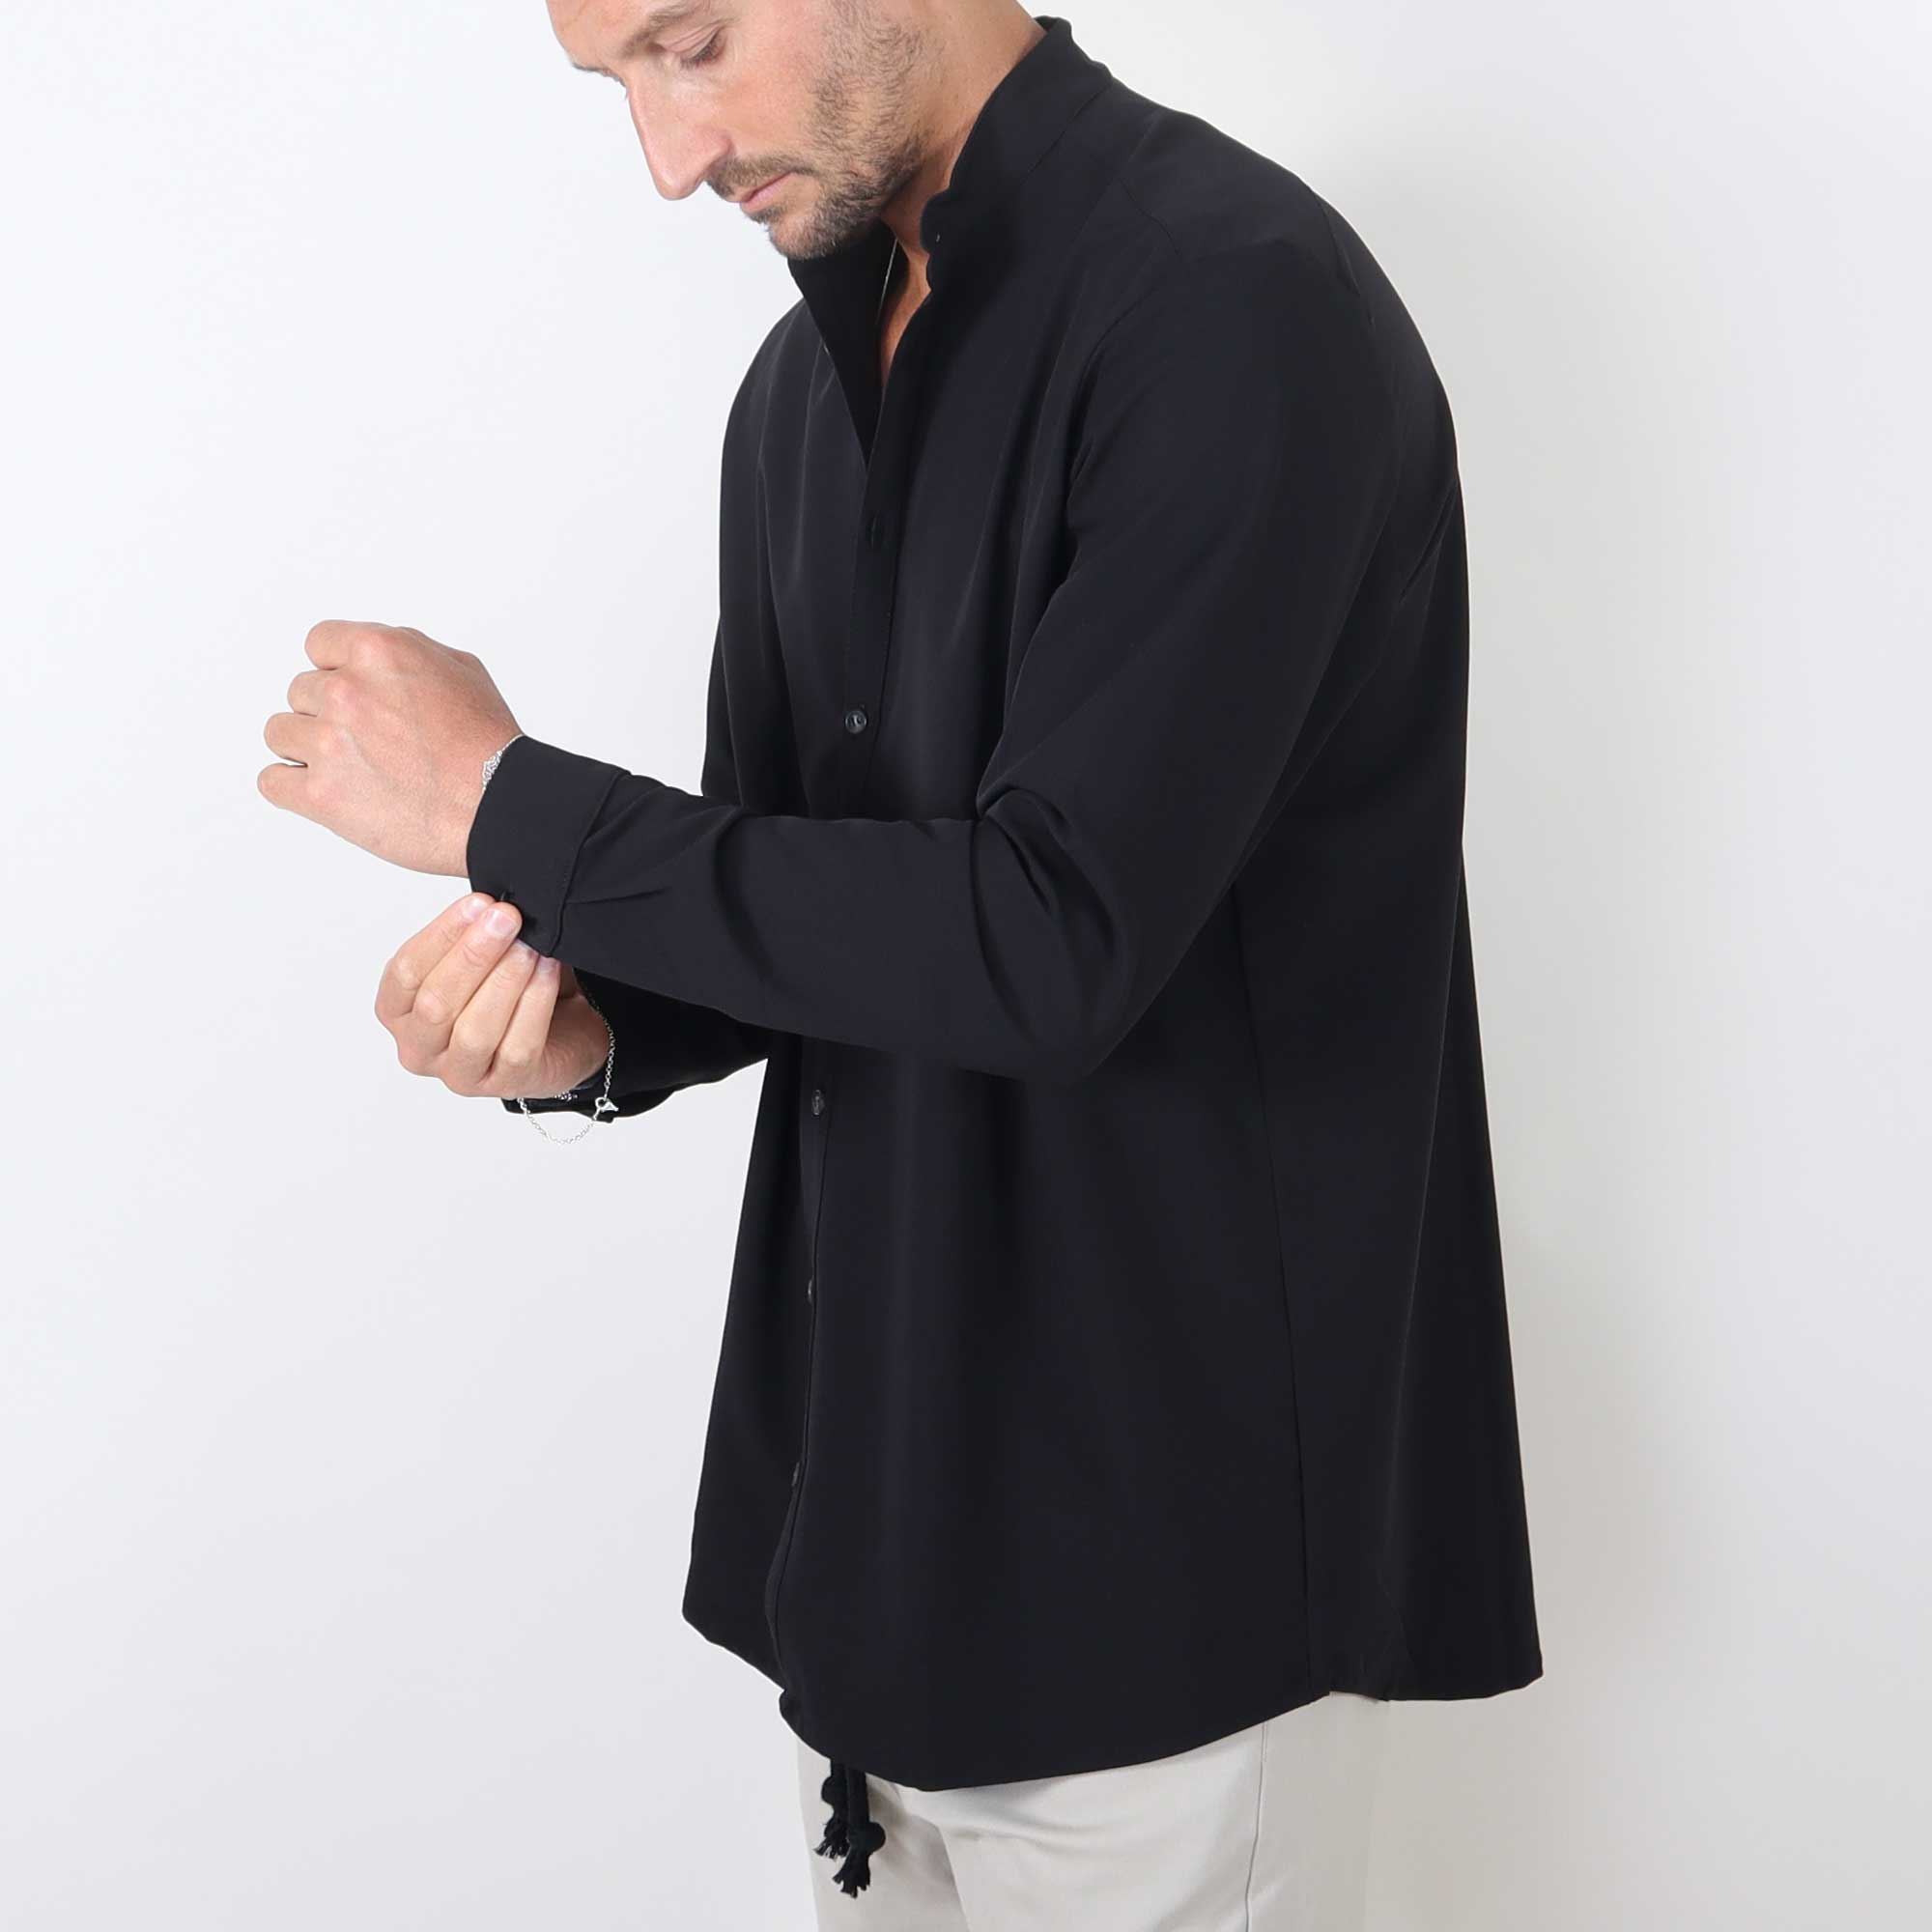 zippy-zwart-3